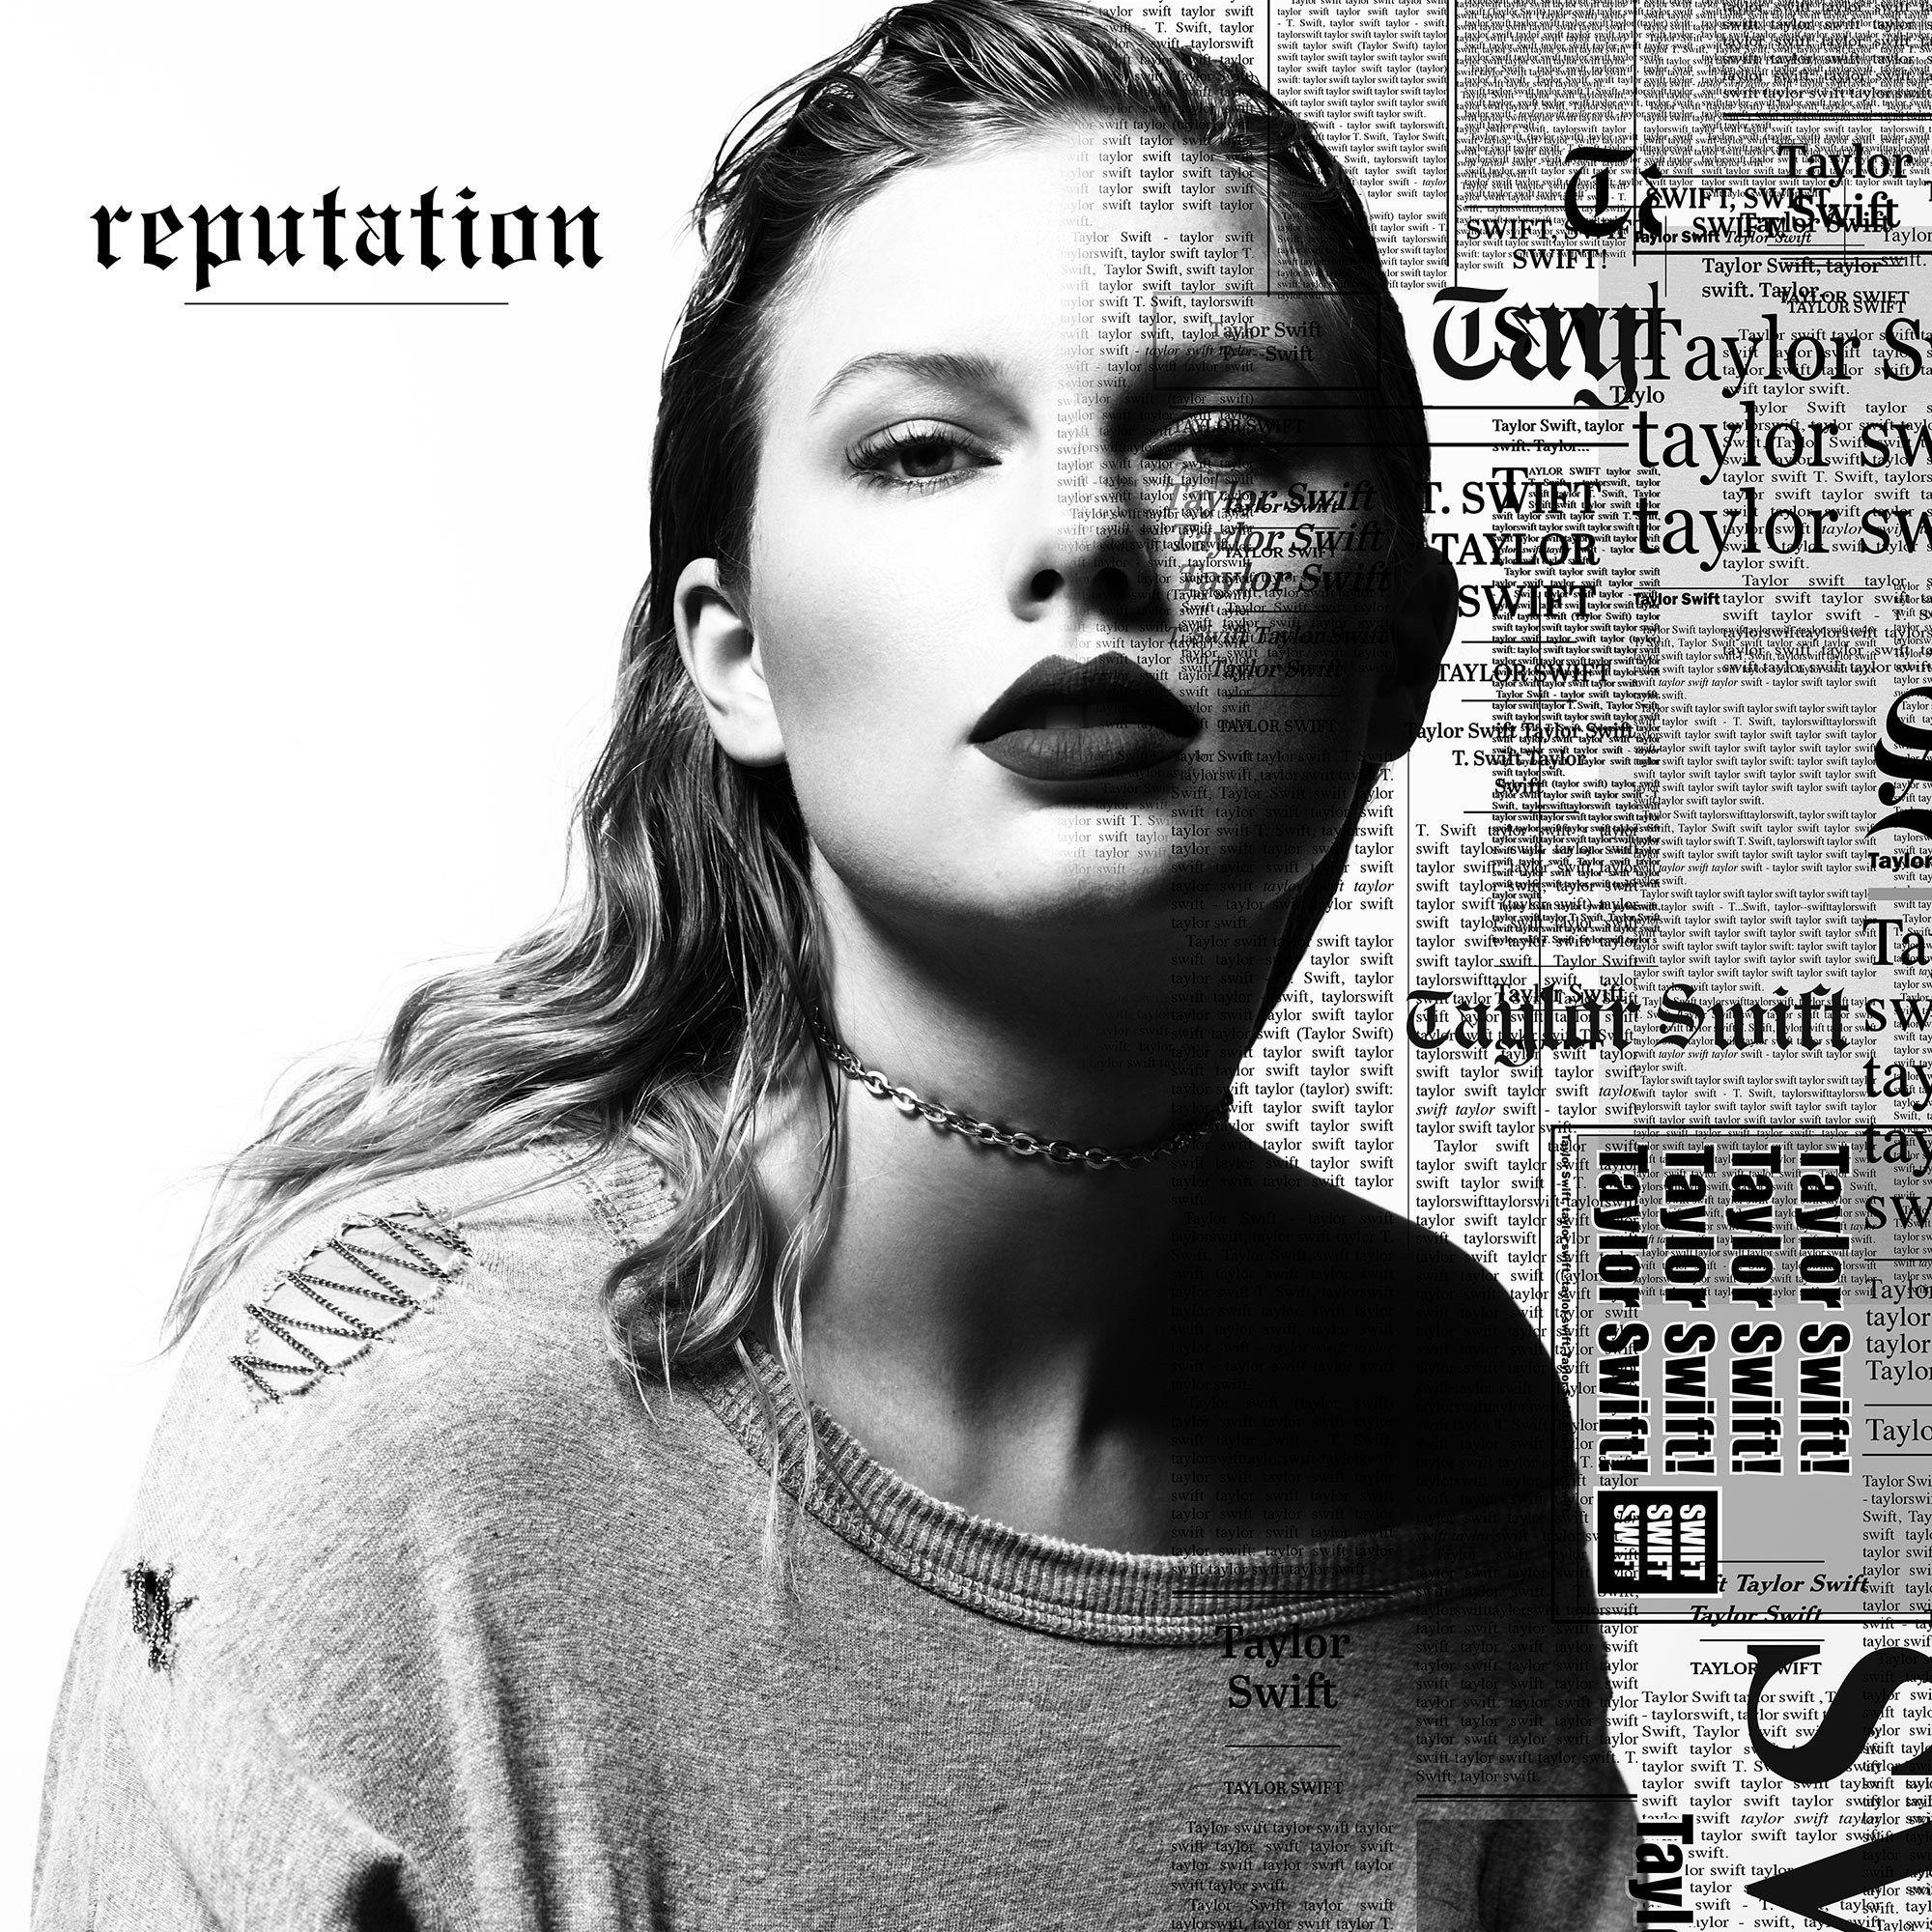 Image Result For Taylor Swift Reputation Album 1080 0 Hd Wallpaper Taylor Swift Album Taylor Swift Album Cover Taylor Swift New Album